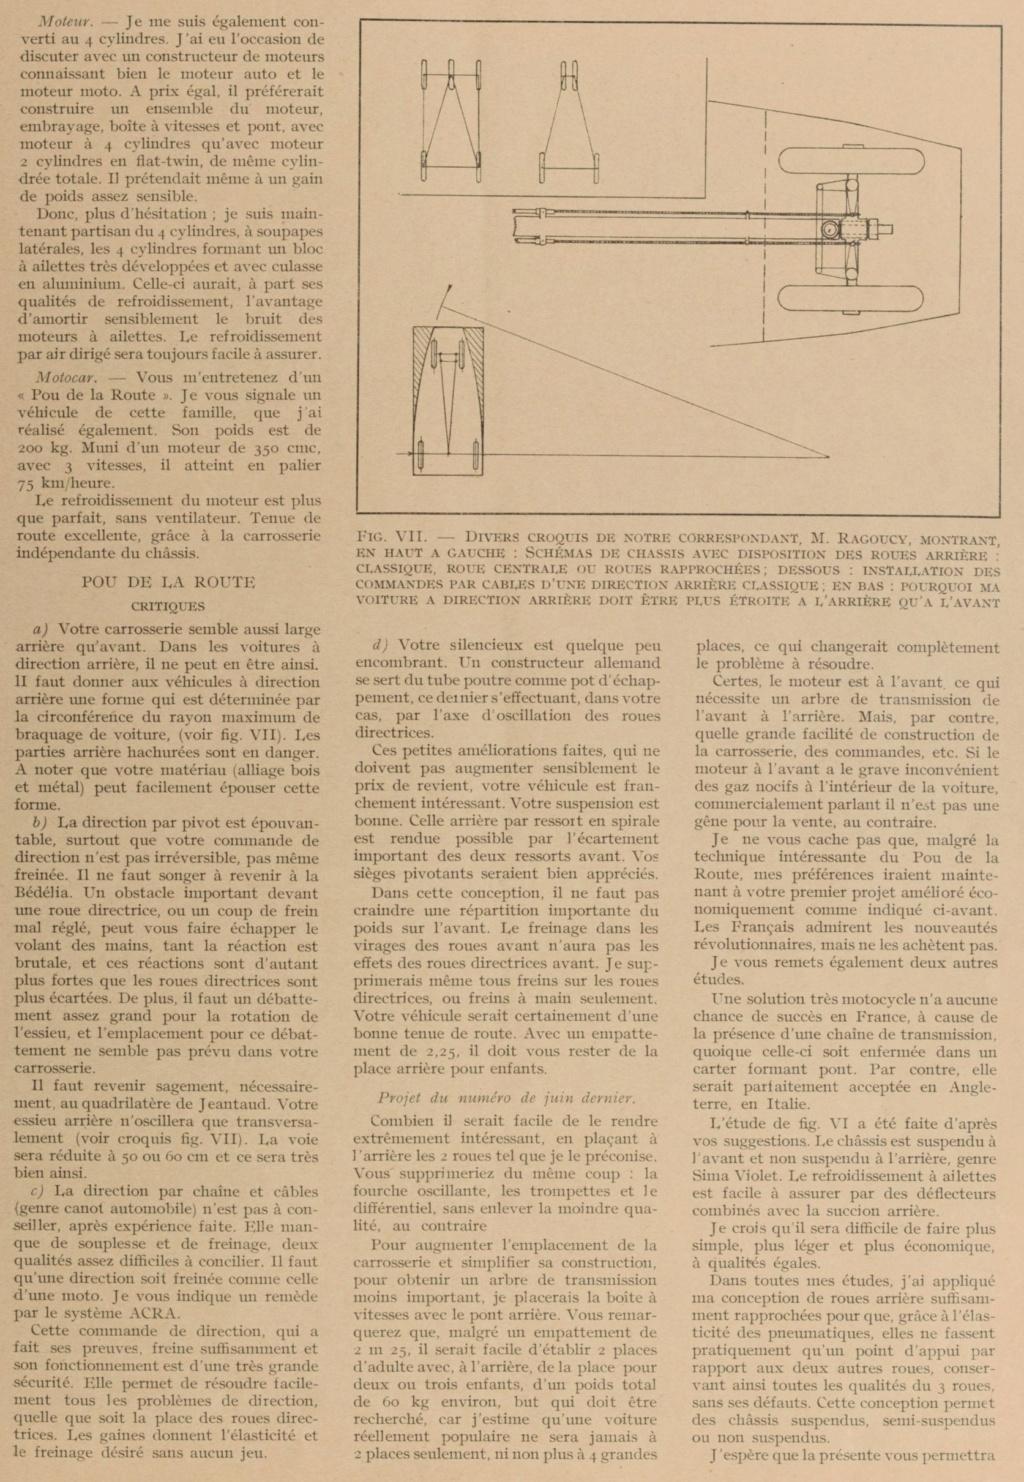 Tricyclecar RAGOUCY 194